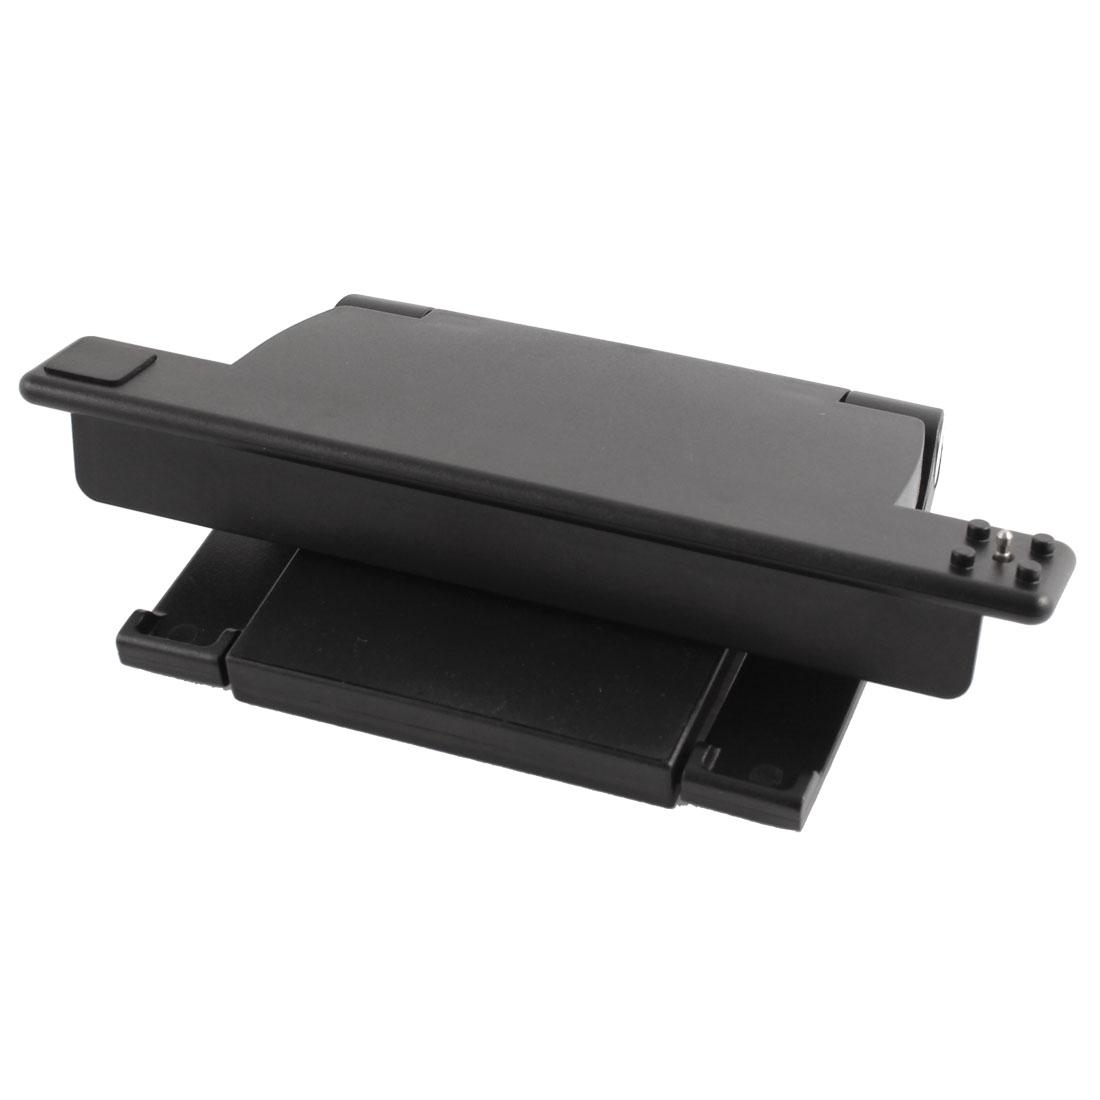 Black Adjustable TV Mounting Clip Holder Stand for PS4 Camera